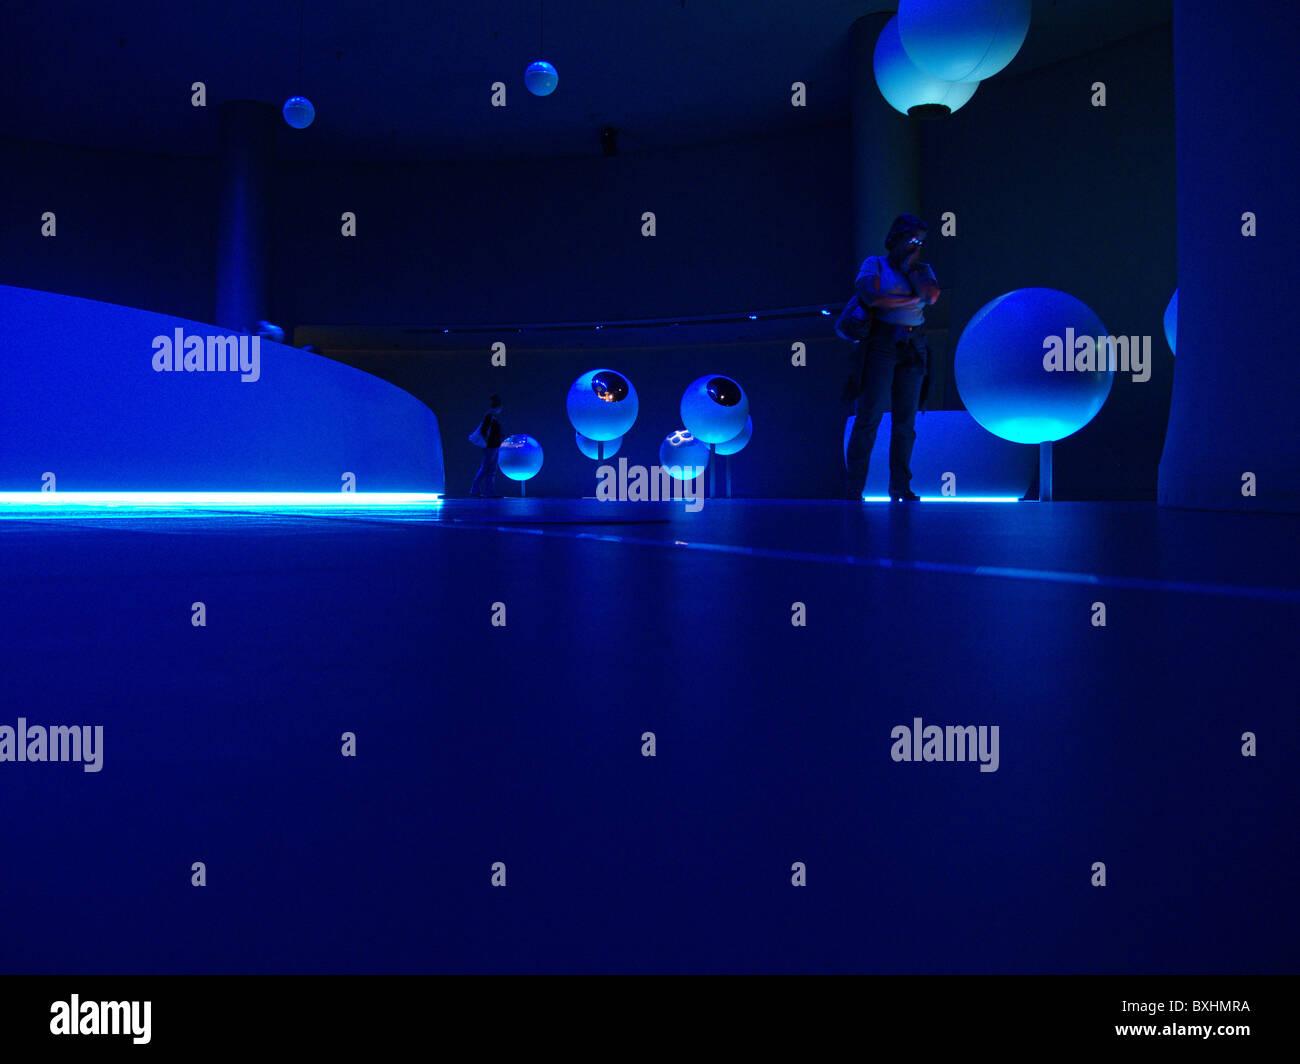 Universe of Particles exhibition, Cern, Geneva, Switzerland - Stock Image